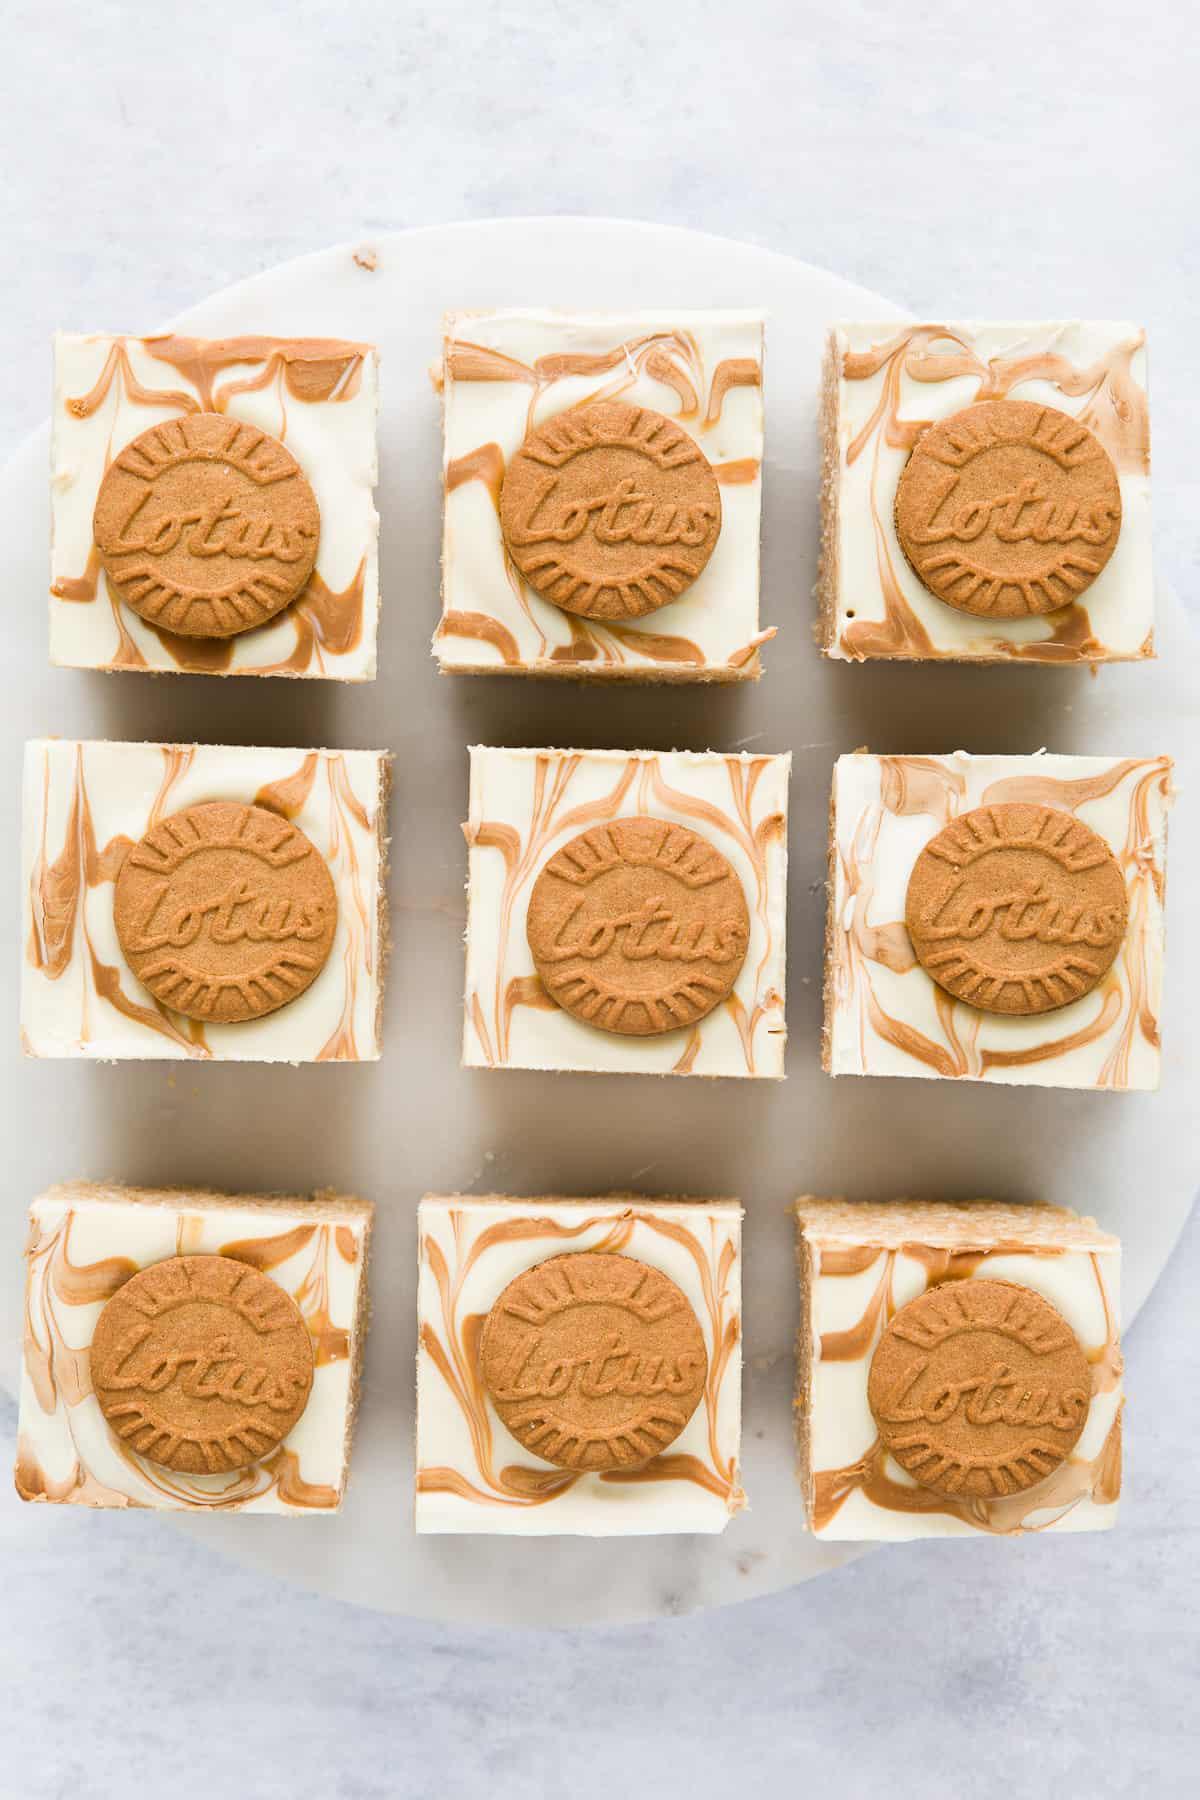 9 squares of Lotus Biscoff Rice Krispie Treats.